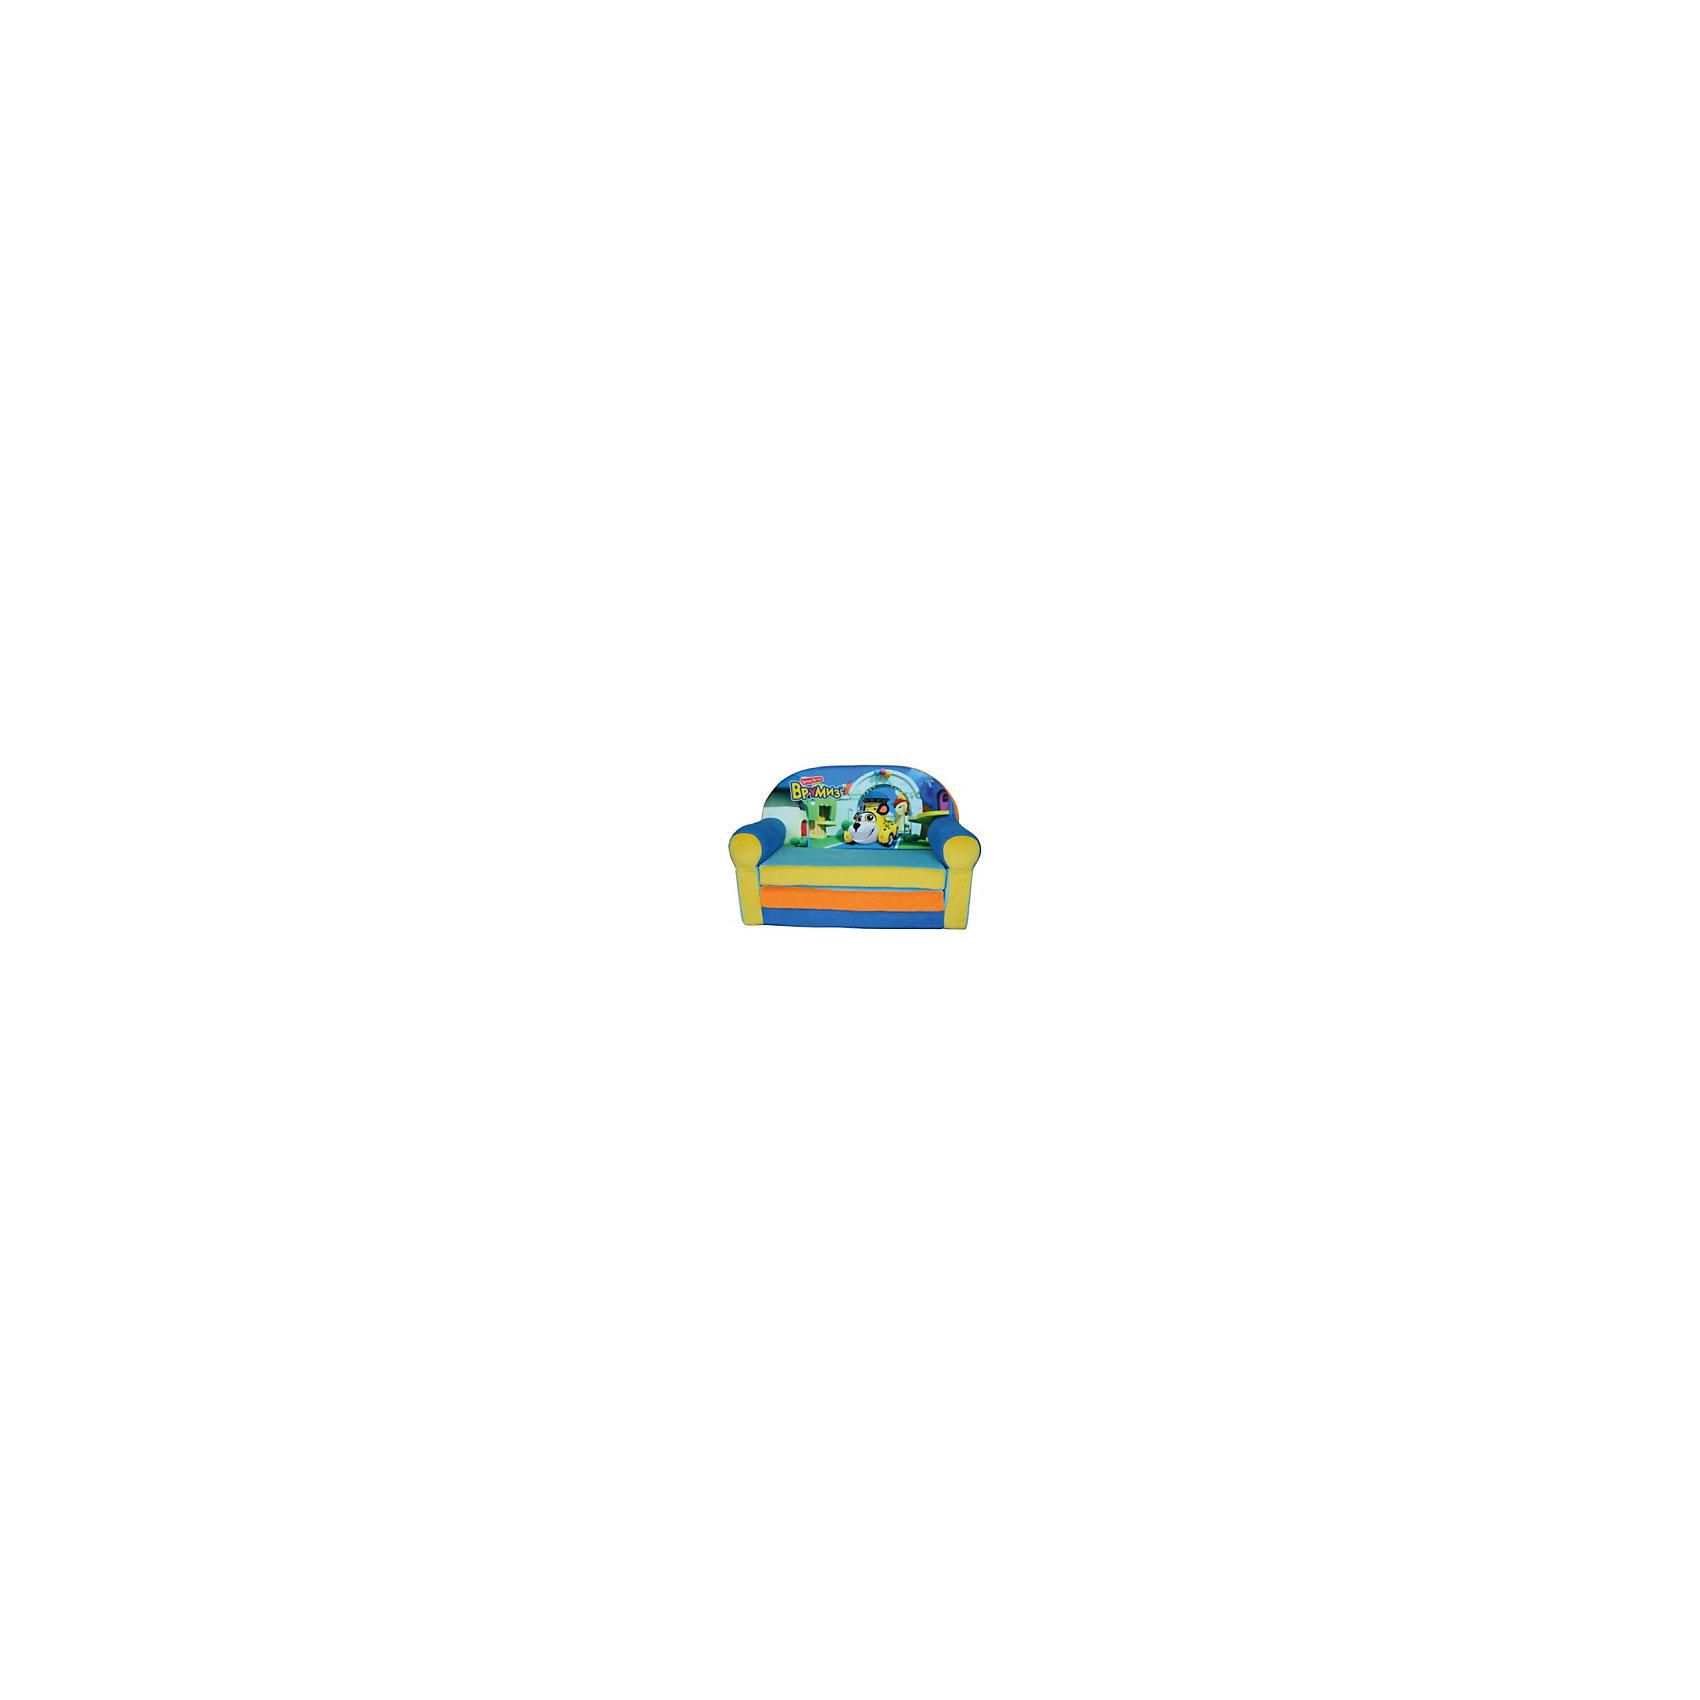 Диван раскладной Врумиз, Small Toys, голубой